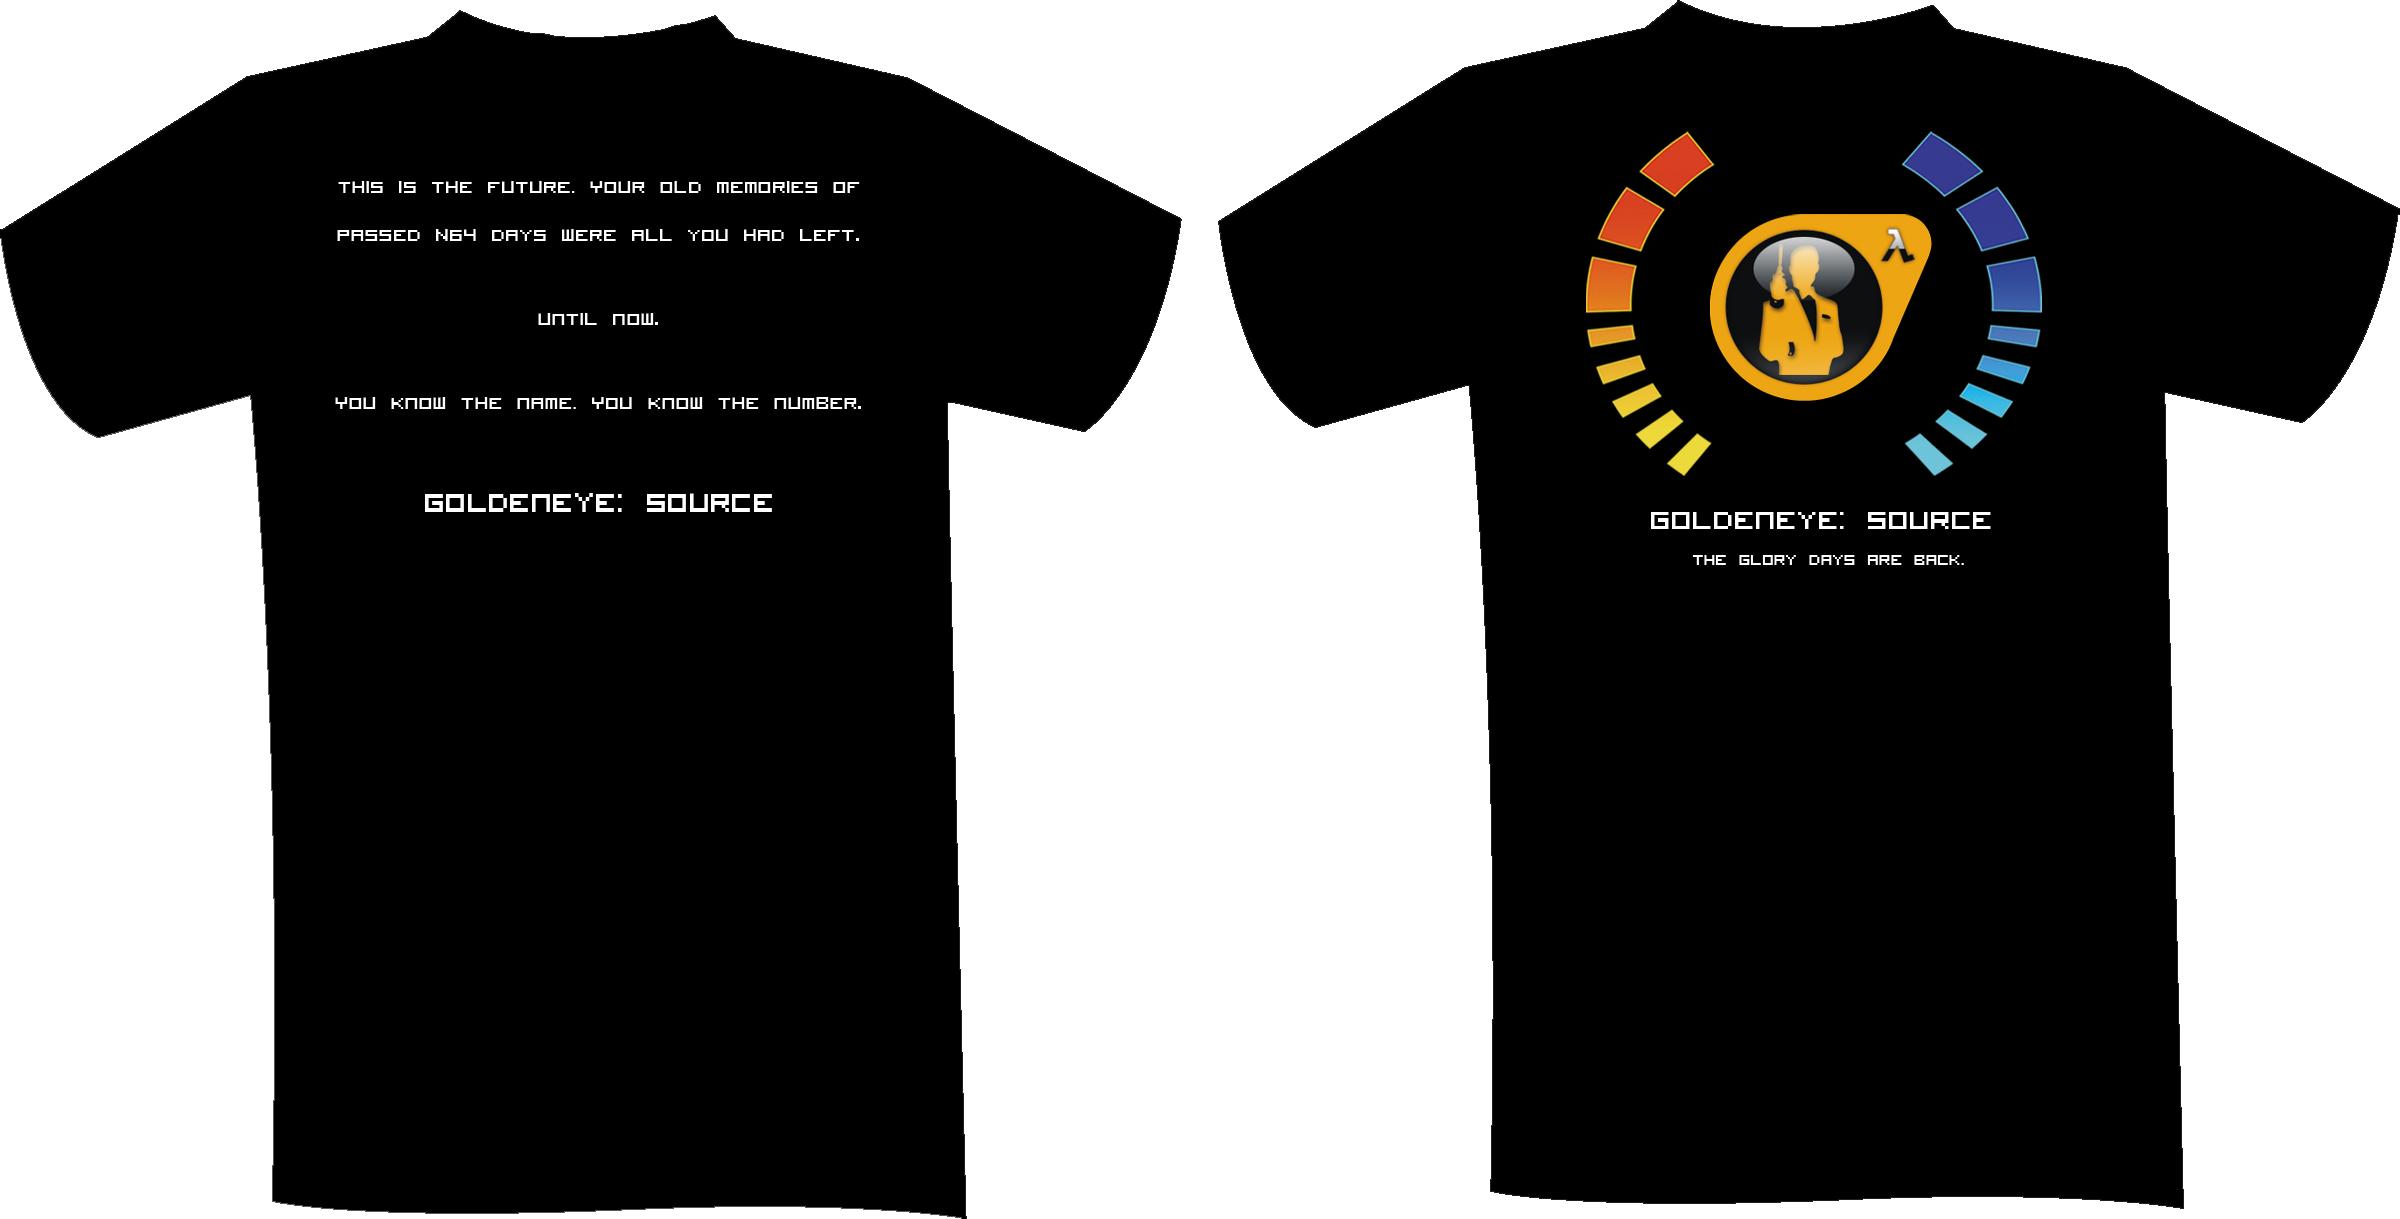 T-shirt design quick -  T Shirt 2 View Original